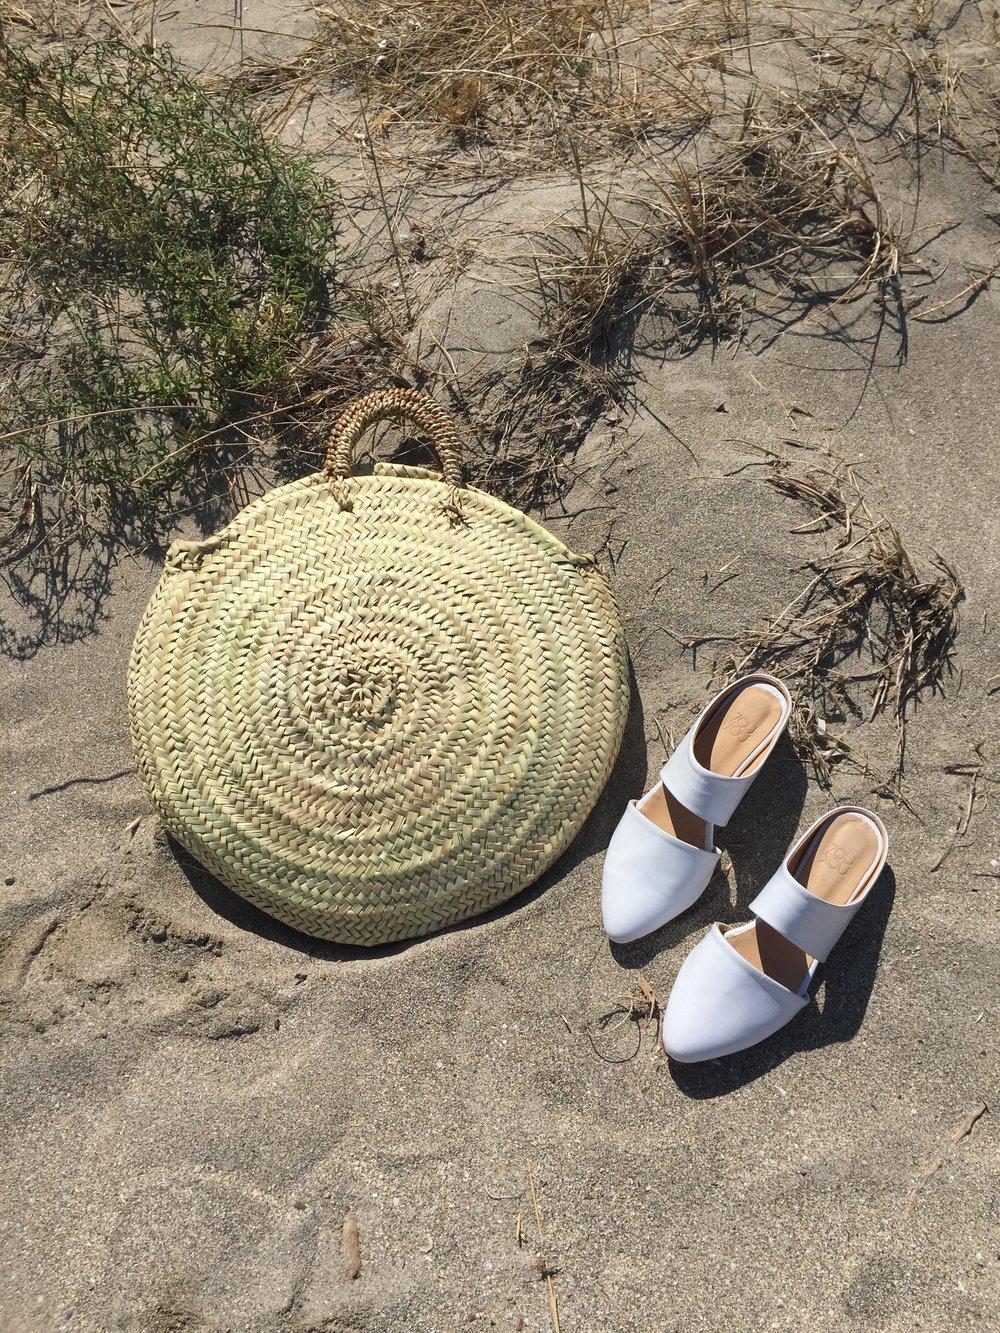 The Mule in White on the Beach in Puglia